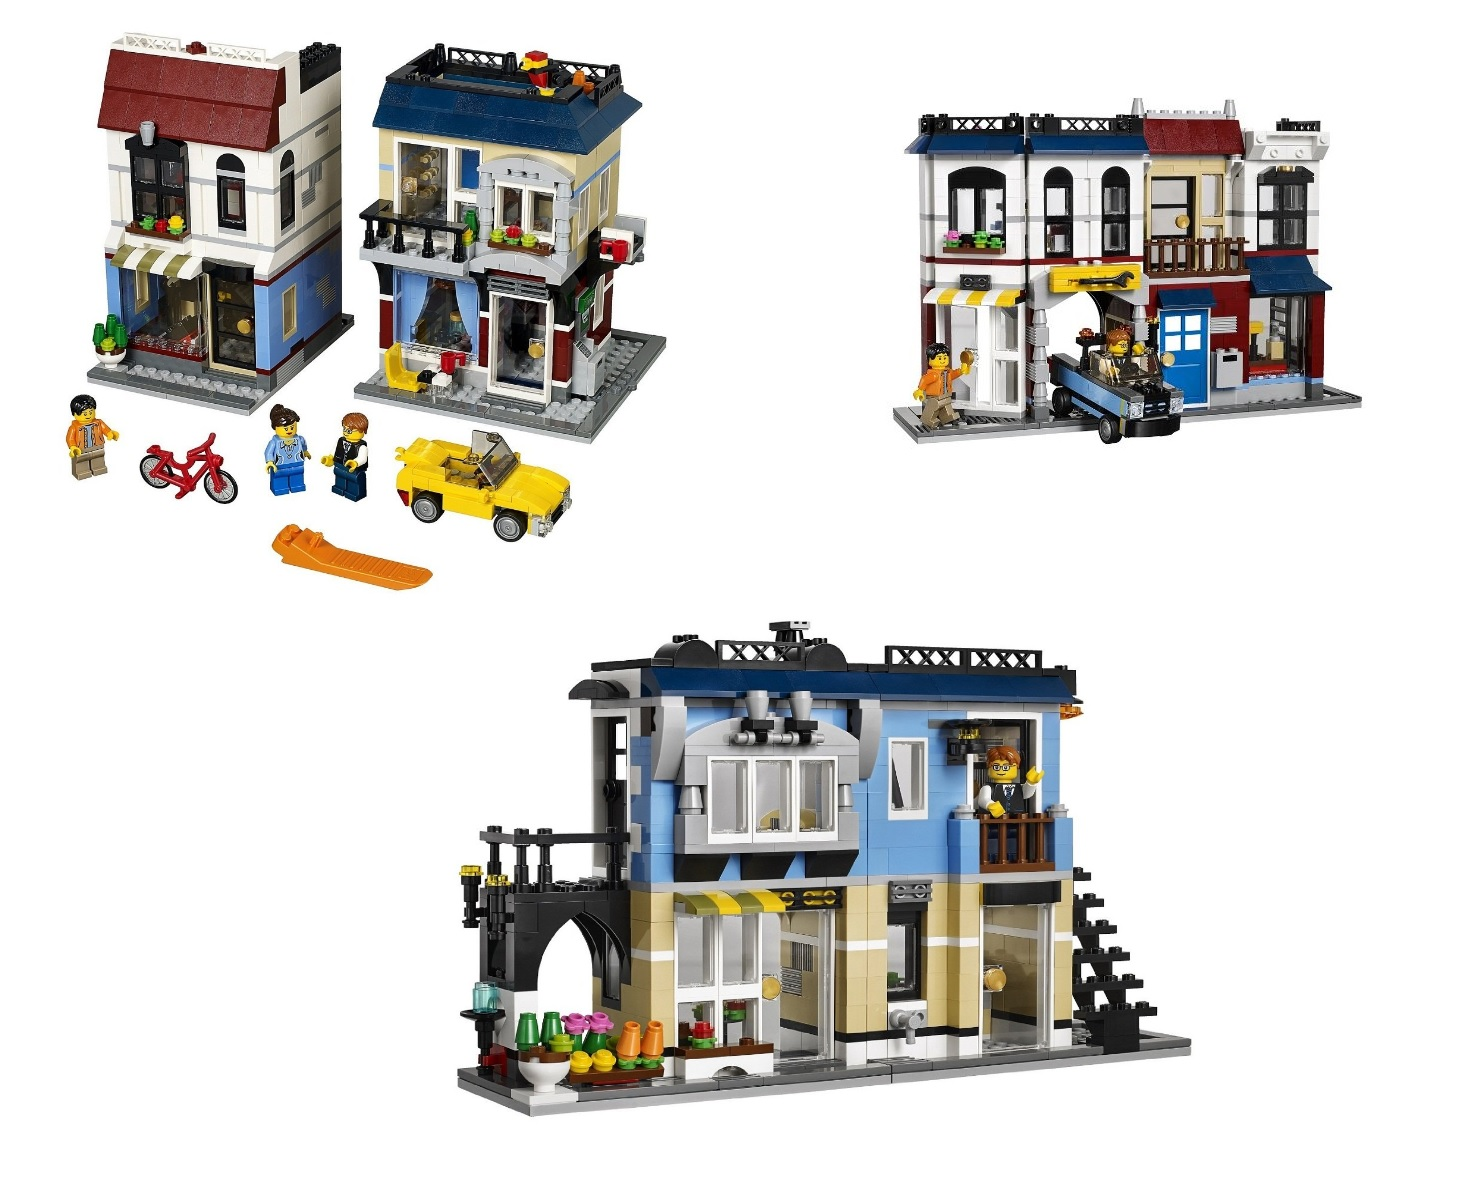 Pin Lego Shop Lego Lego Creator Lego Creator 10241 Maersk on Pinterest Lego Creator Treehouse